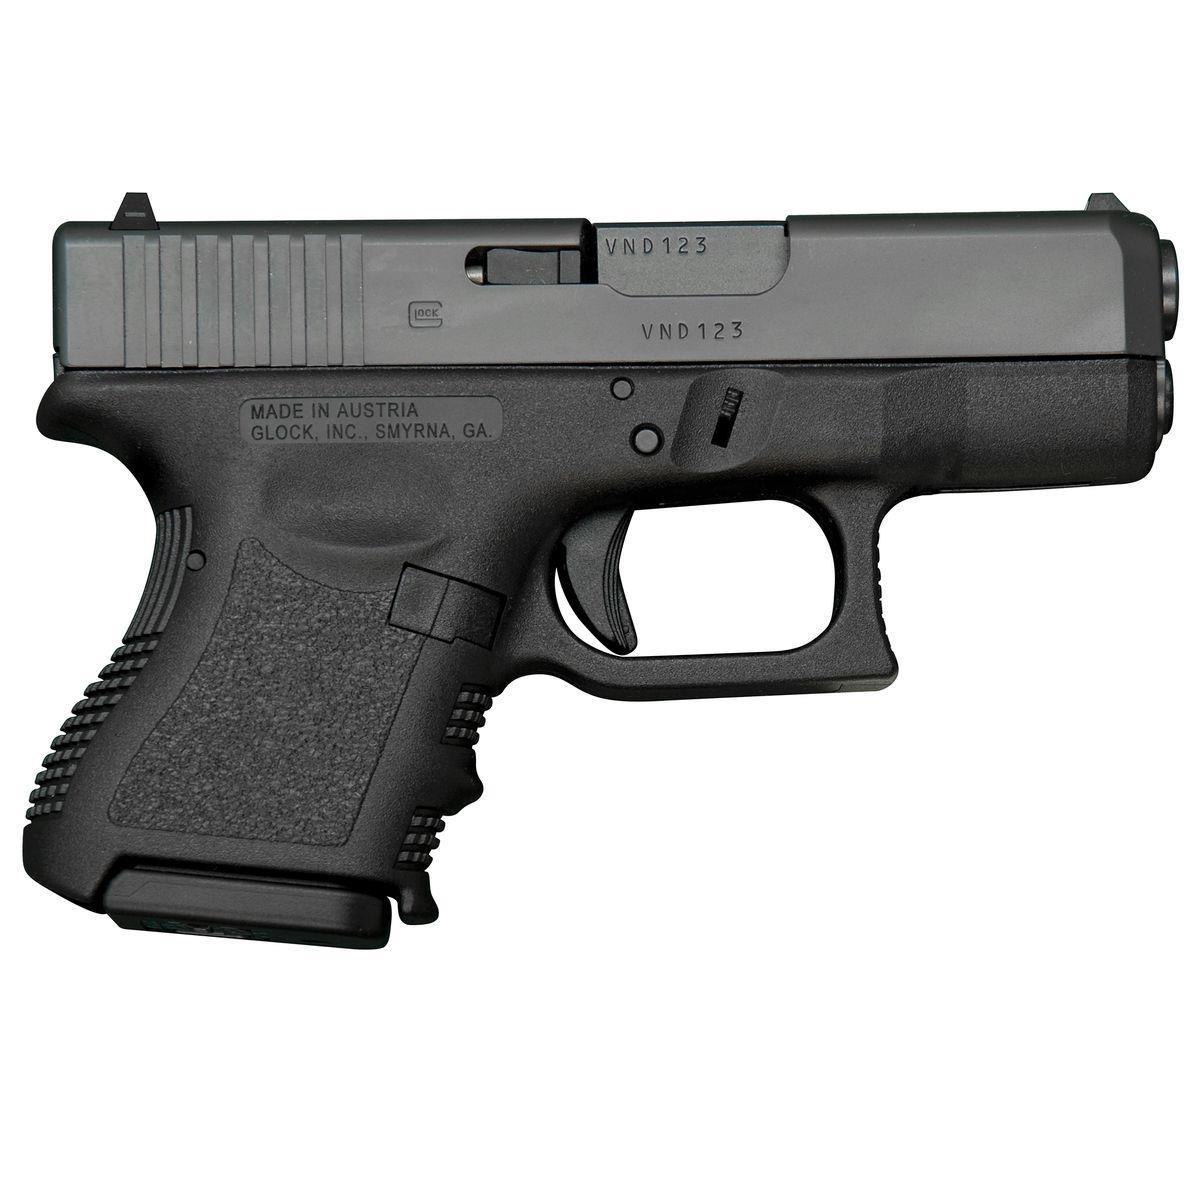 Glock 26 Gen 4 9mm 10RD Pistol - Hunter's Refuge